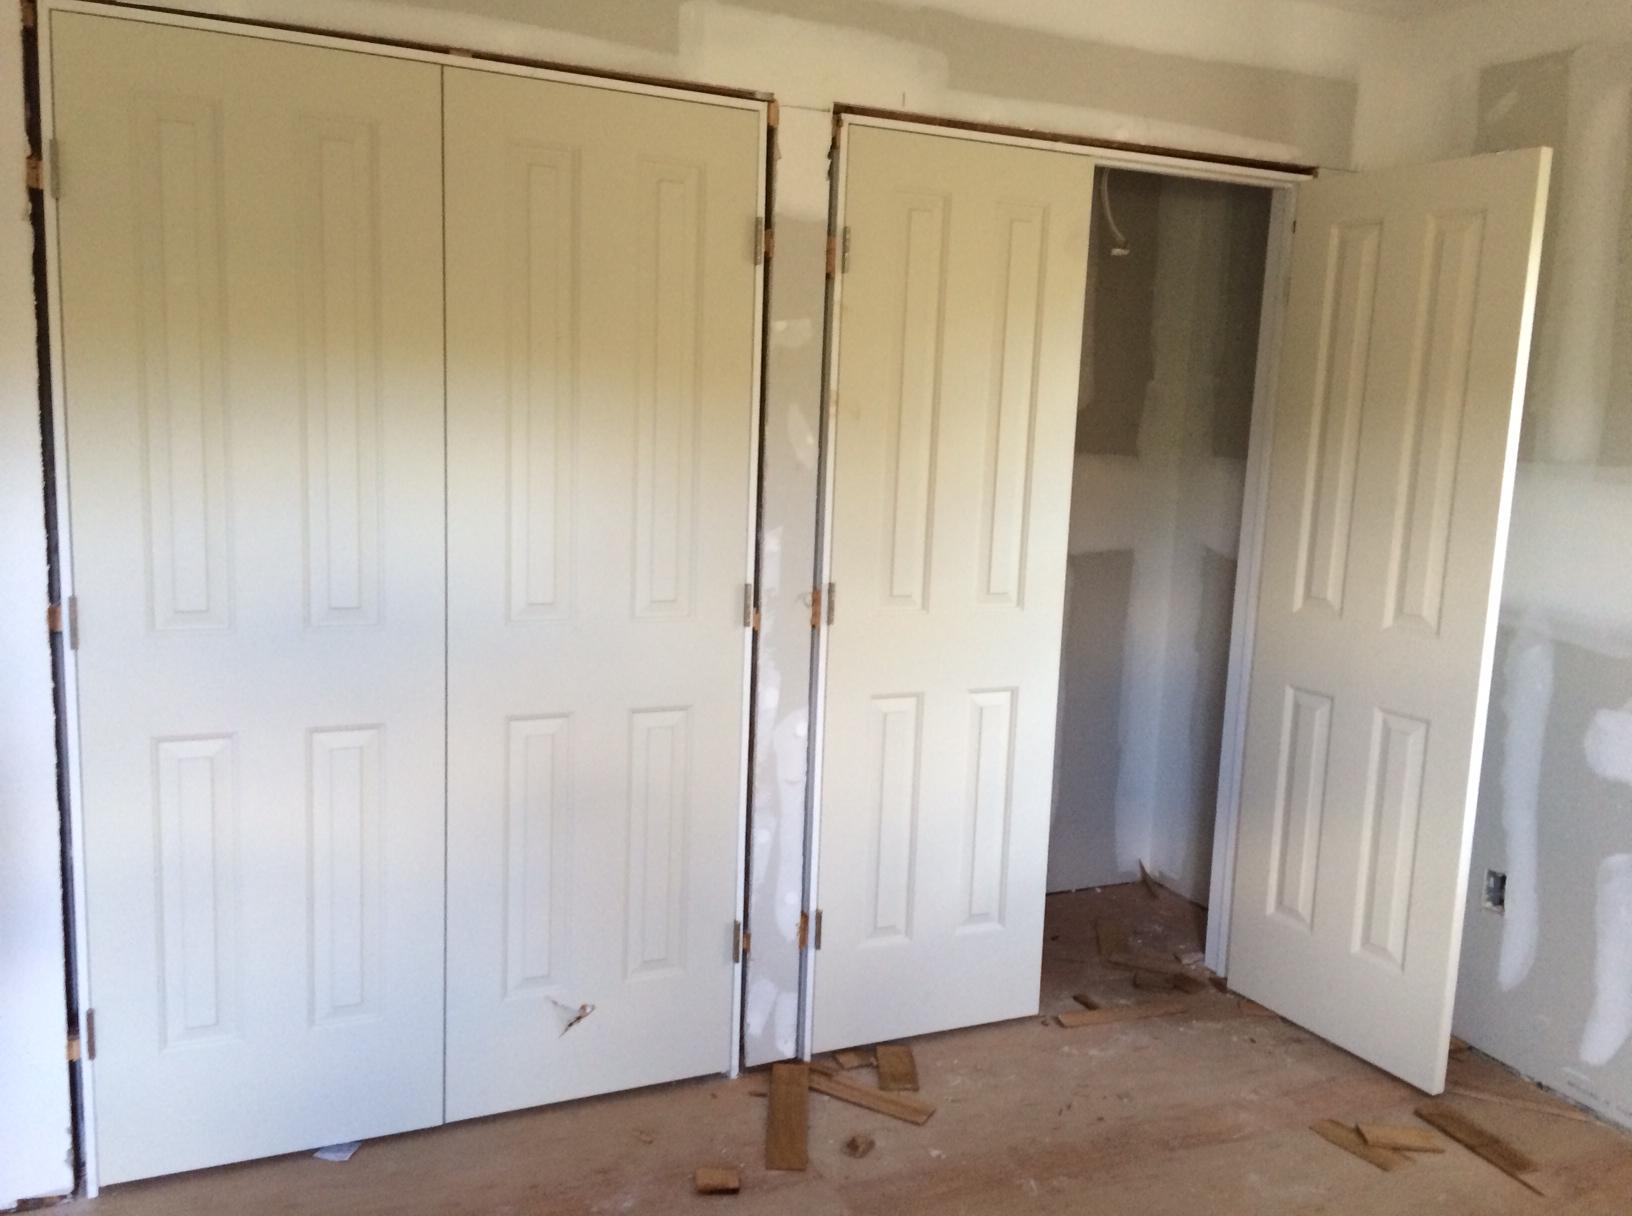 Updating Closet Doors September 2014 Salty Suburban Homestead